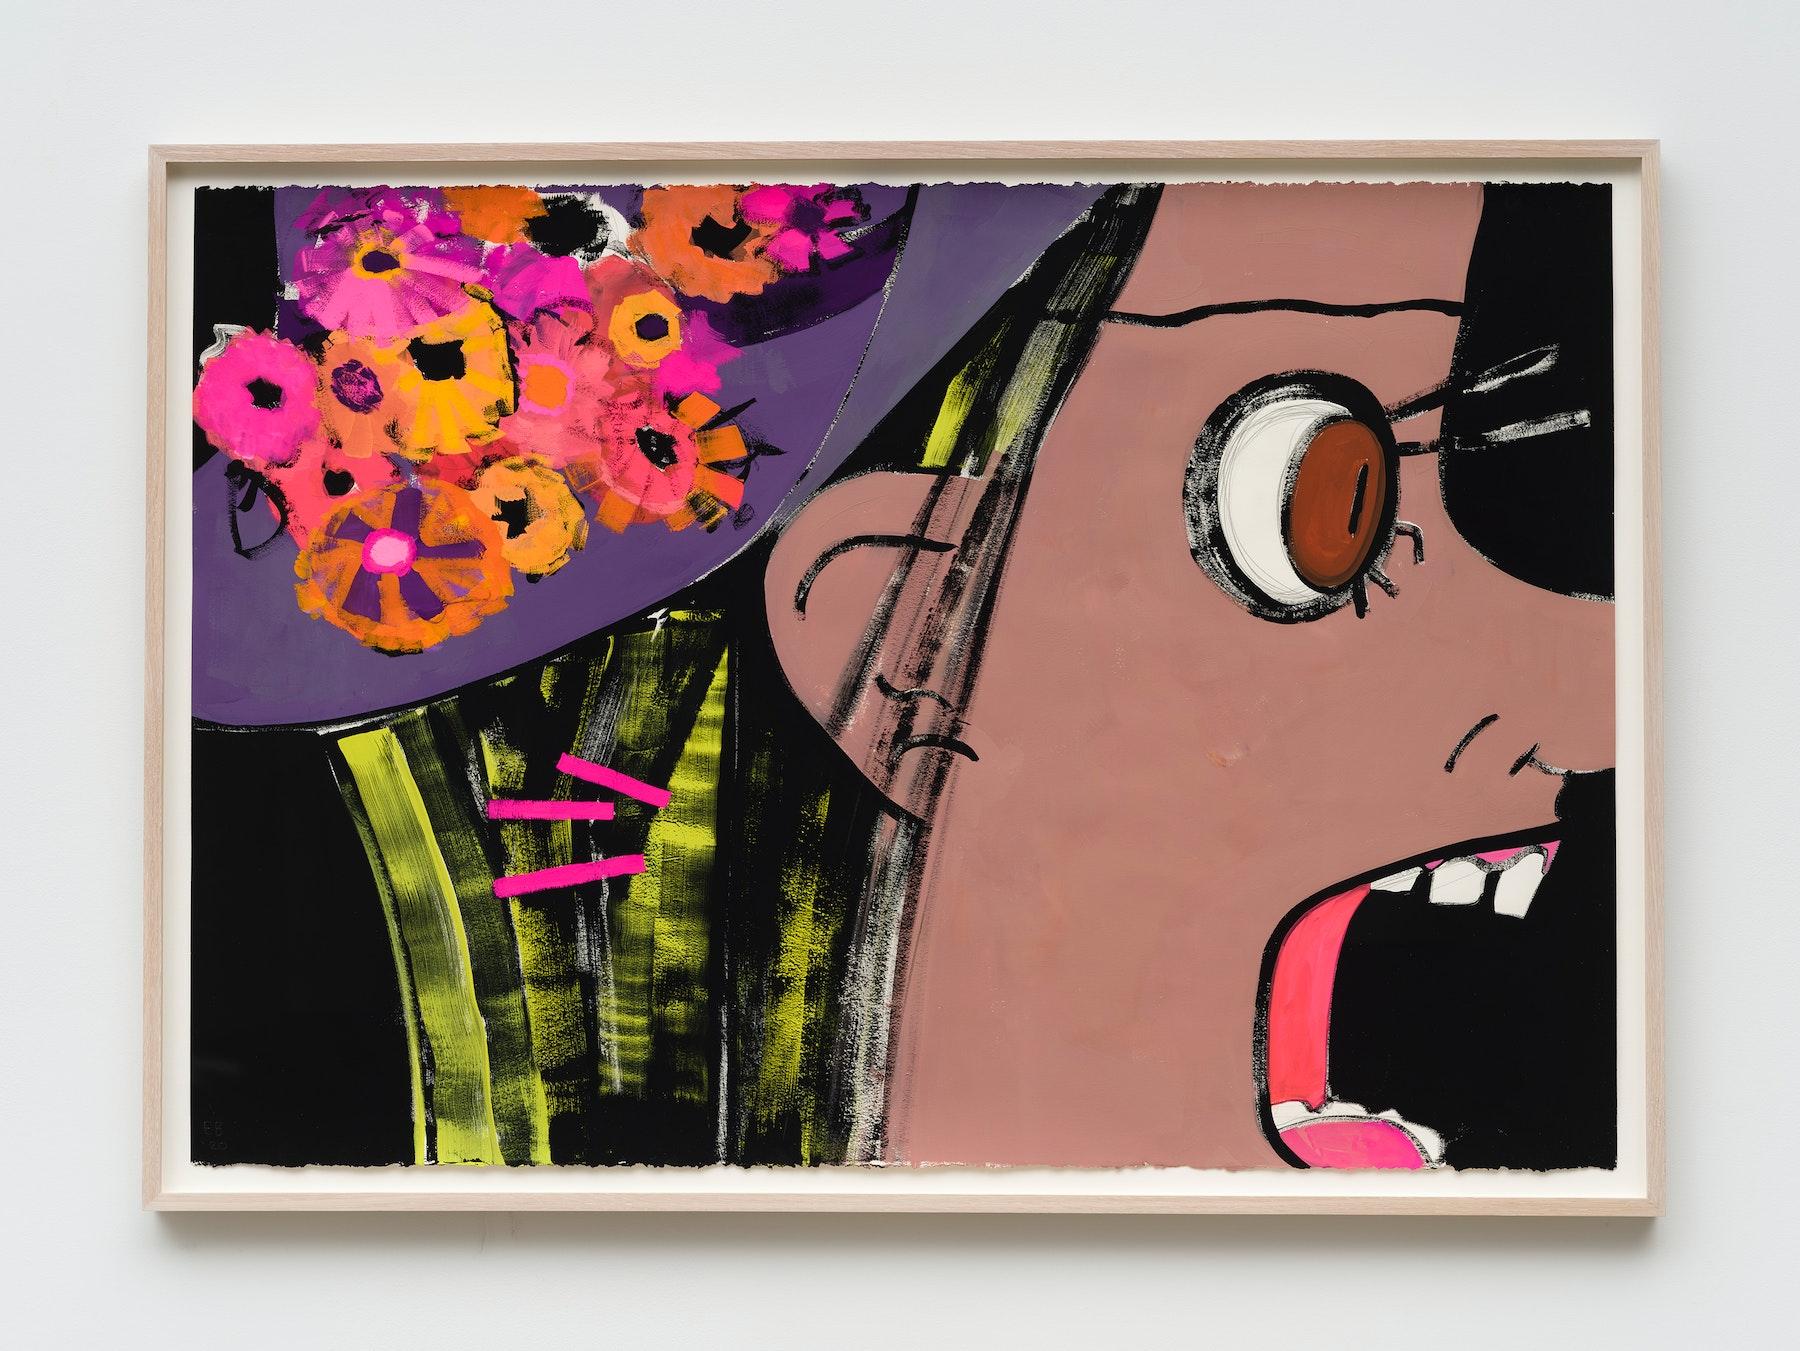 "Ellen Berkenblit ""Orange Juice,"" 2020 Gouache and graphite on Legion Stonehenge paper 30"" x 44"" [HxW] (76.2 x 111.76 cm) Inventory #BER206 Courtesy of the artist and Vielmetter Los Angeles Photo credit: Jeff Mclane Signed ""EB '20"""